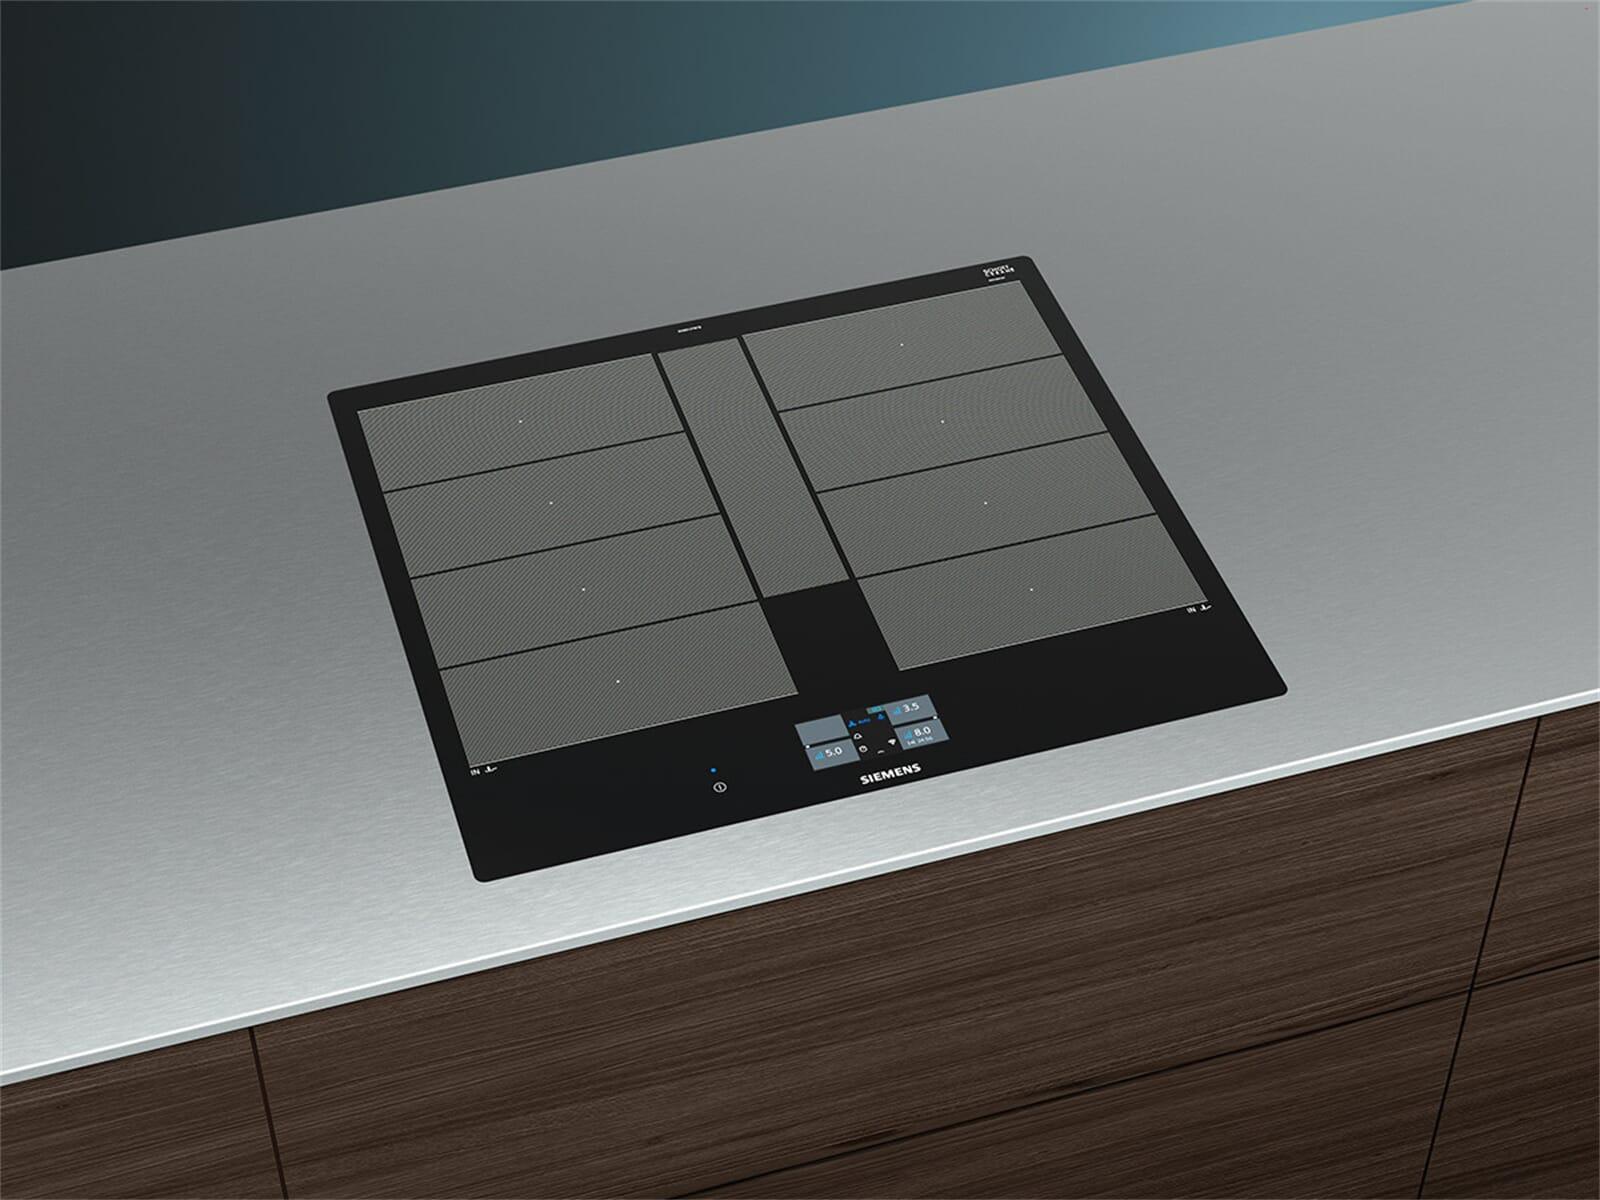 siemens ex601jyw1e induktionskochfeld autark. Black Bedroom Furniture Sets. Home Design Ideas